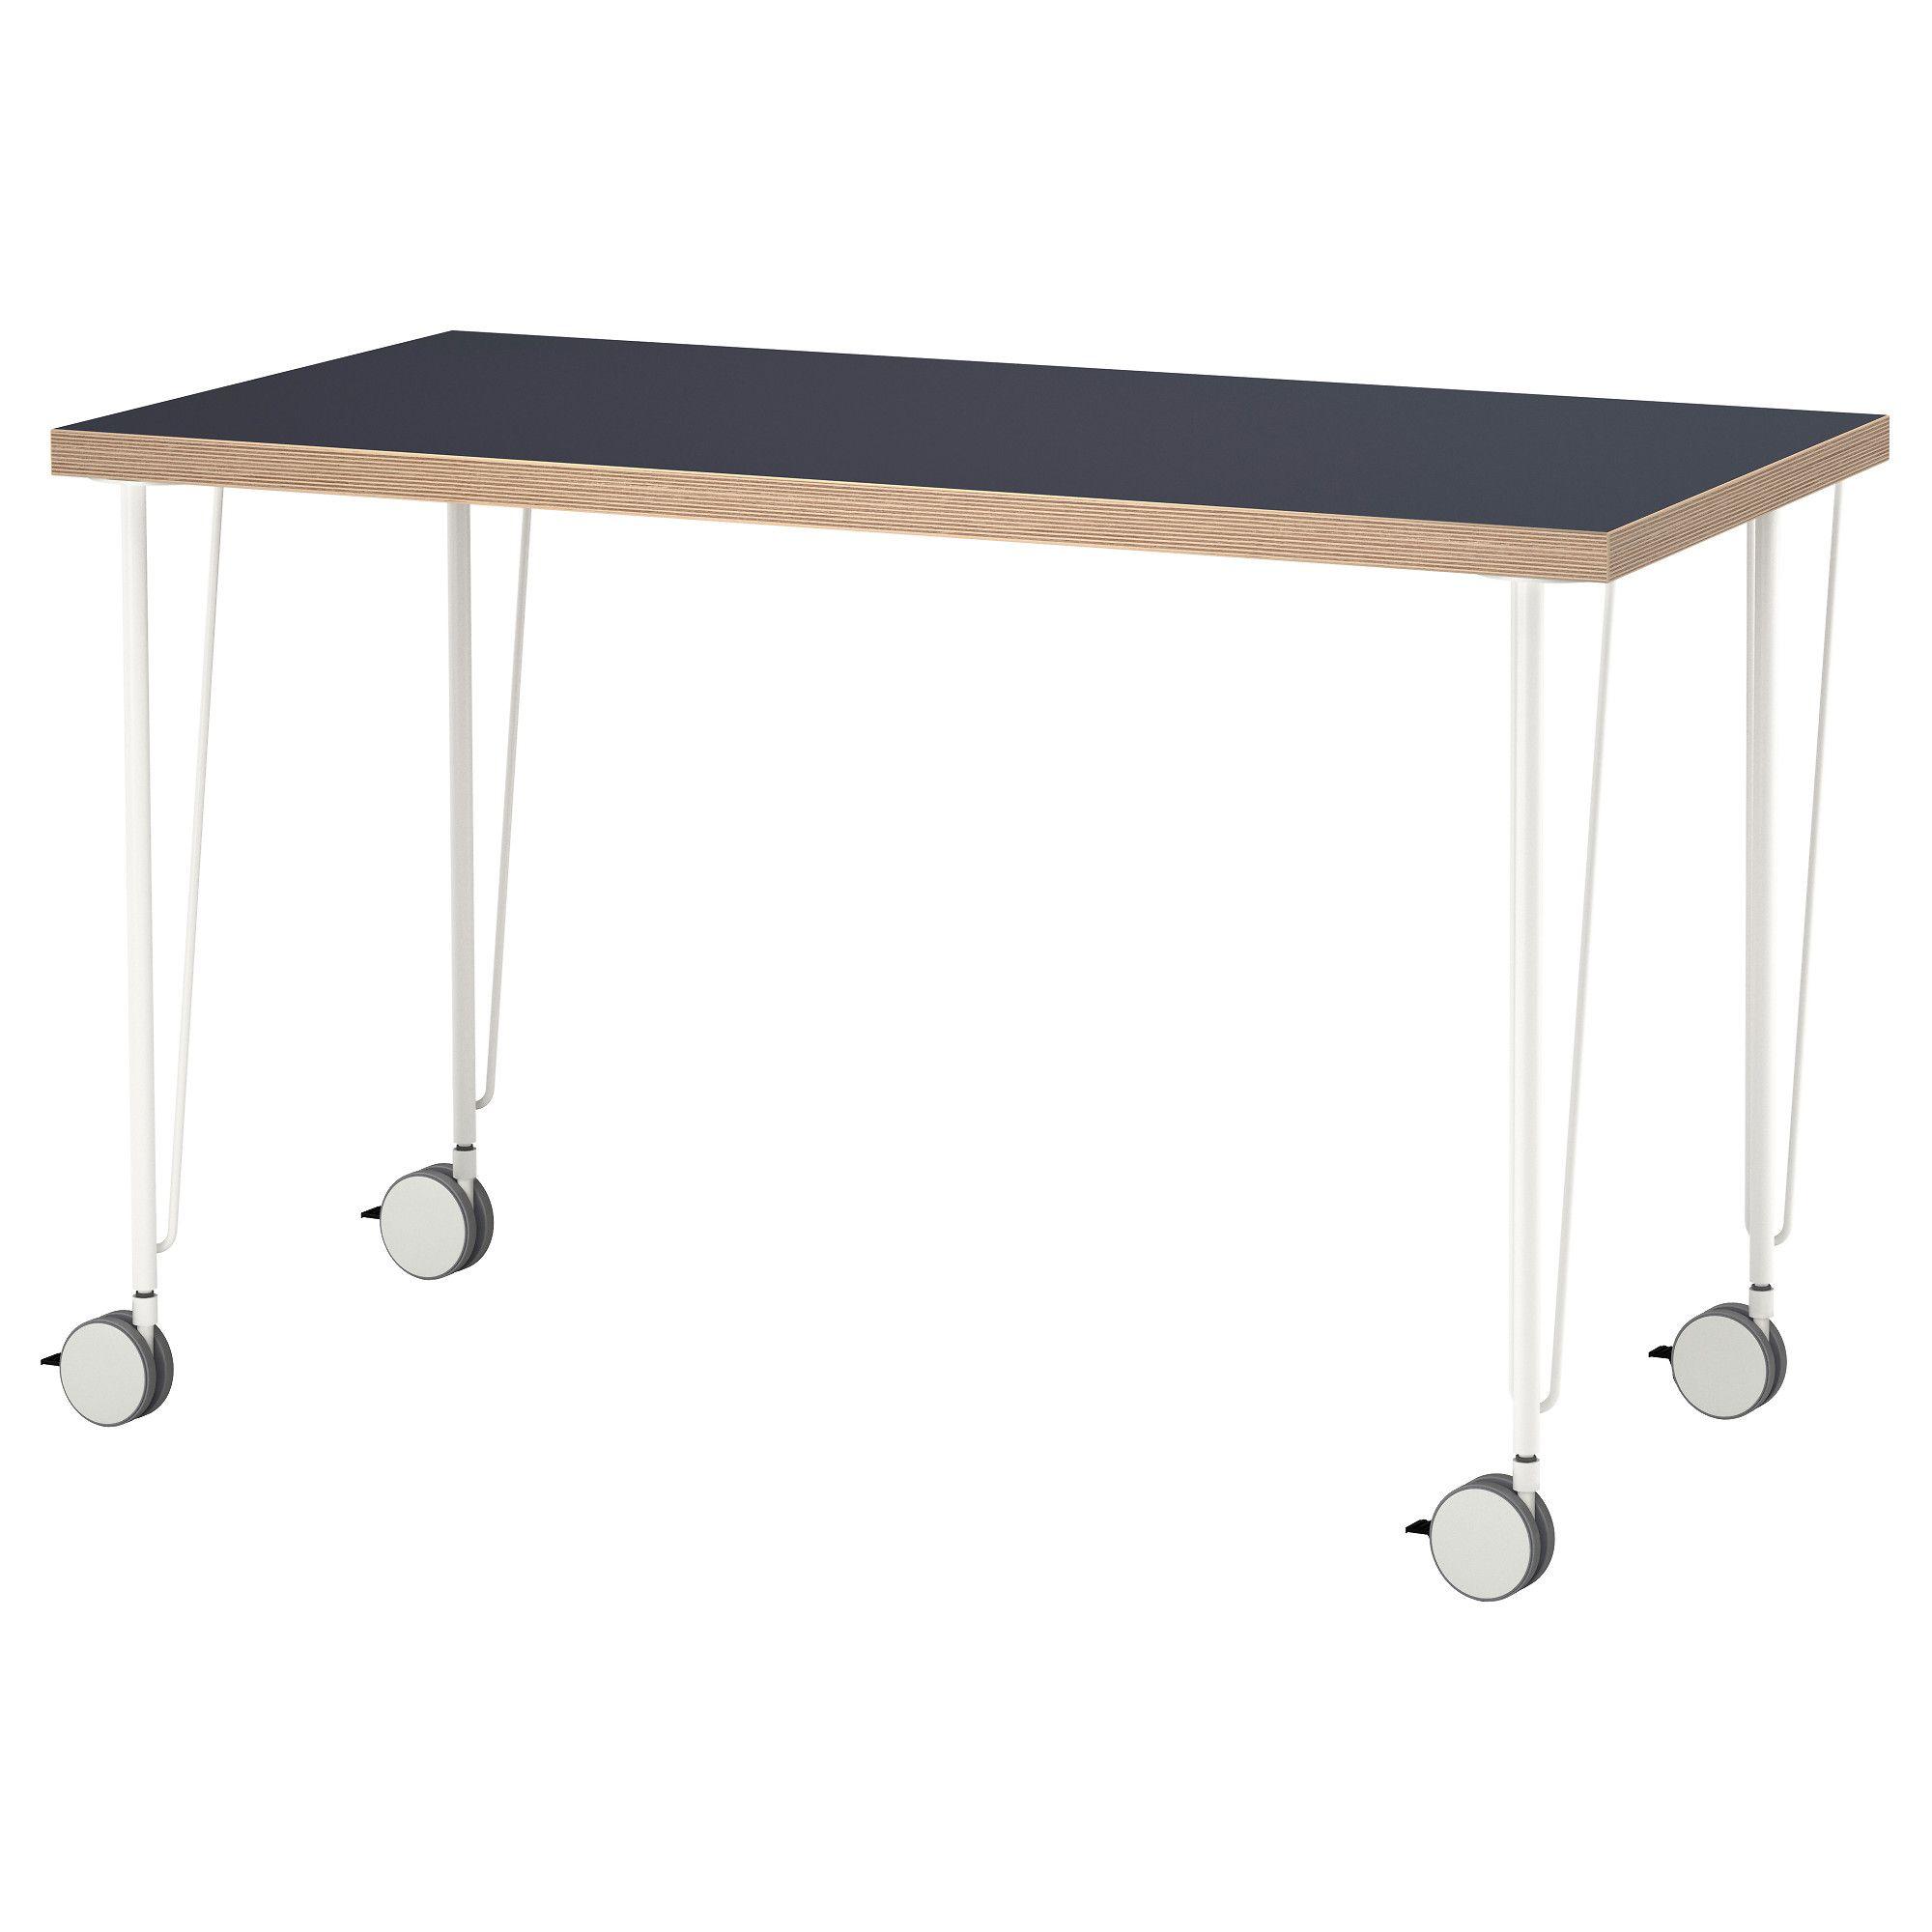 Linnmon Krille Stół Niebieski Biały Ikea Pinterest Ikea